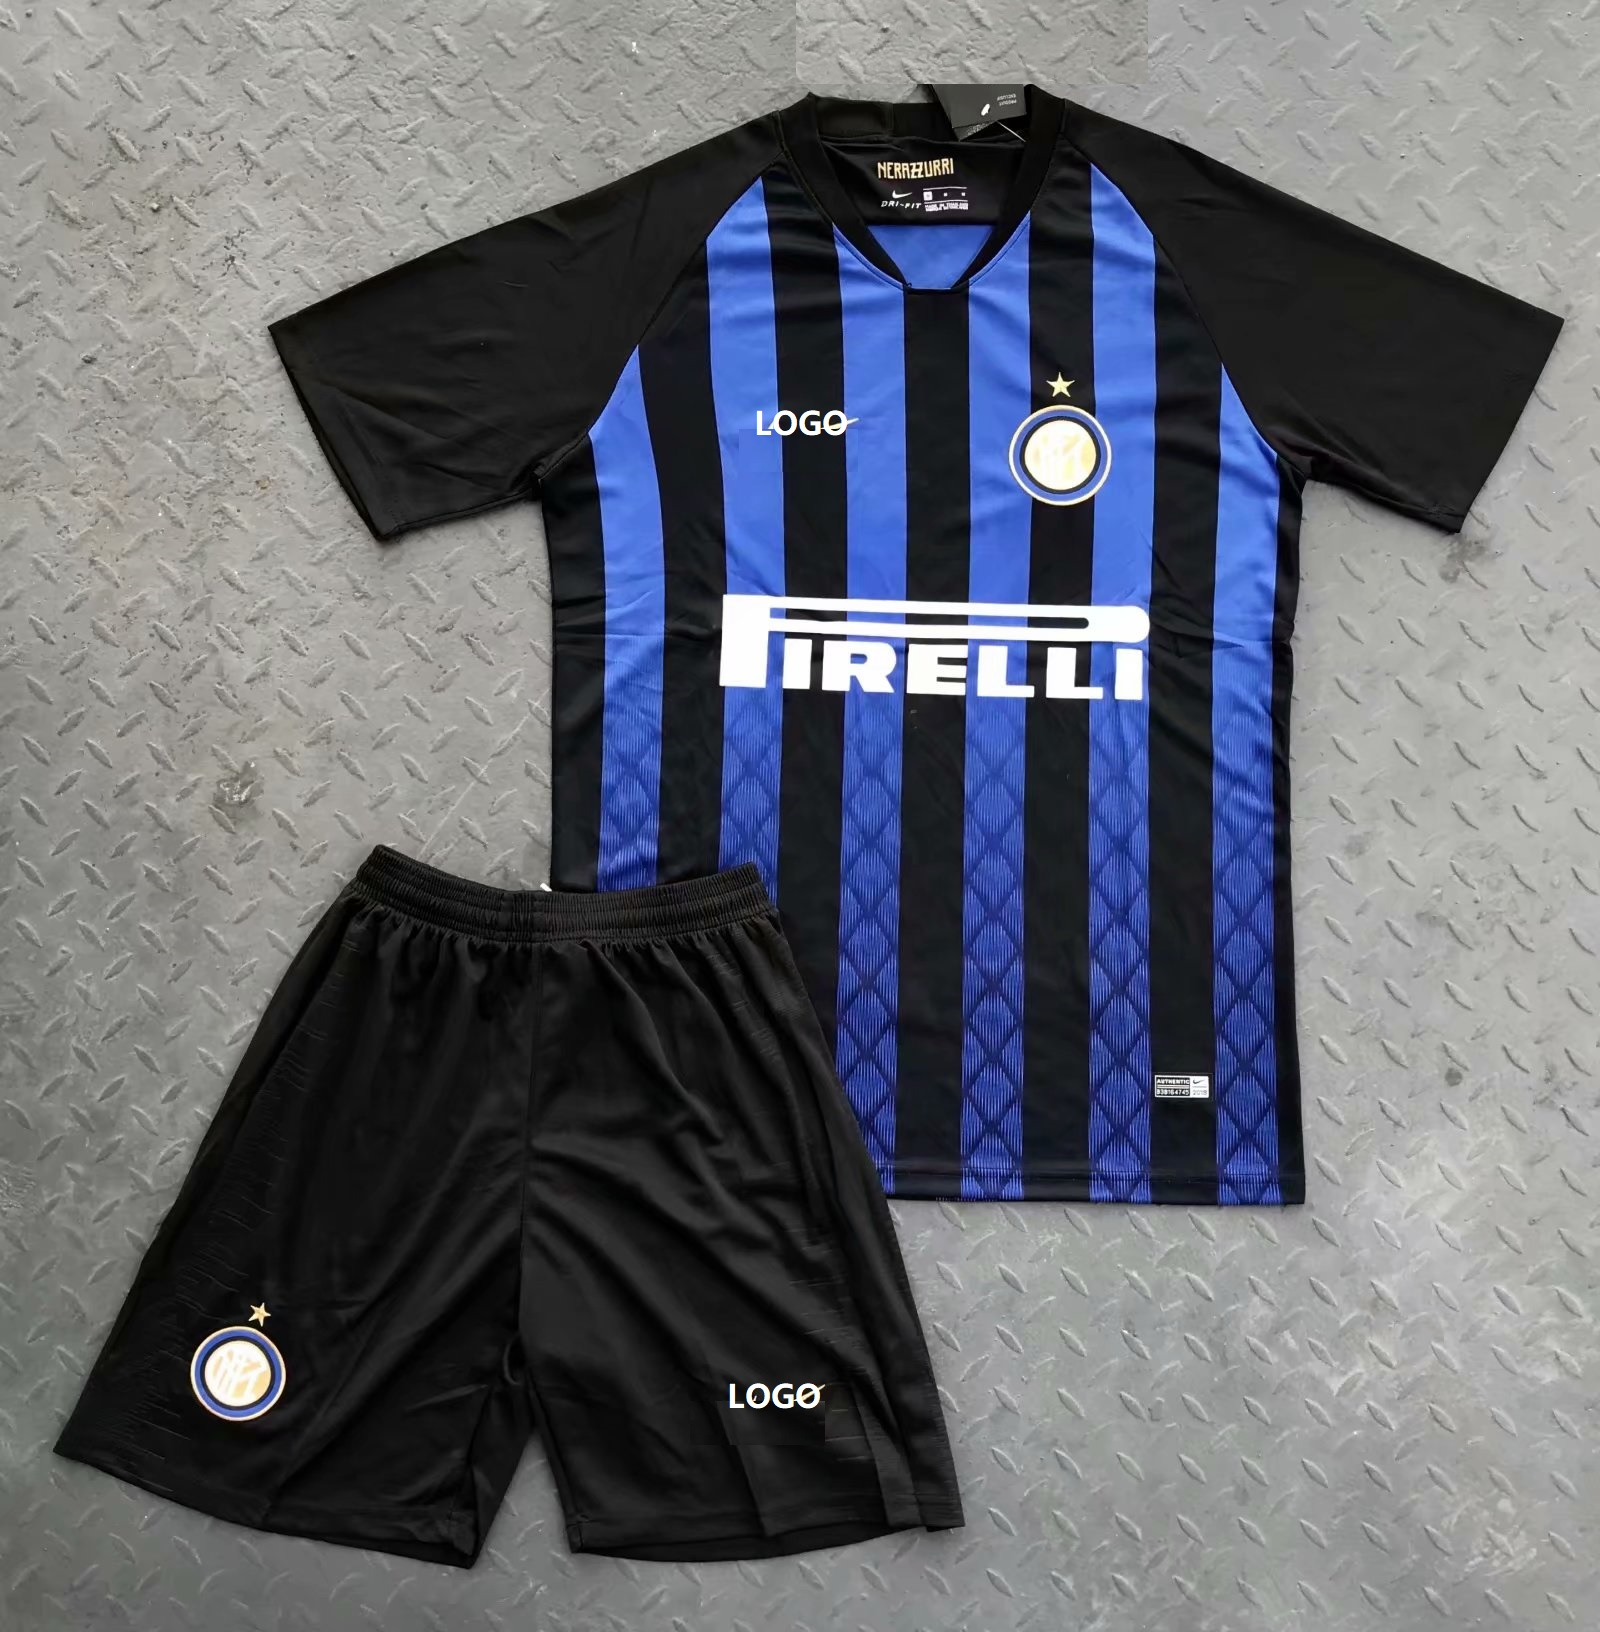 3176cb53f12 2018 19 Inter Milan Home Blue Soccer Jersey Uniform Custom Football Jersey  Uniform